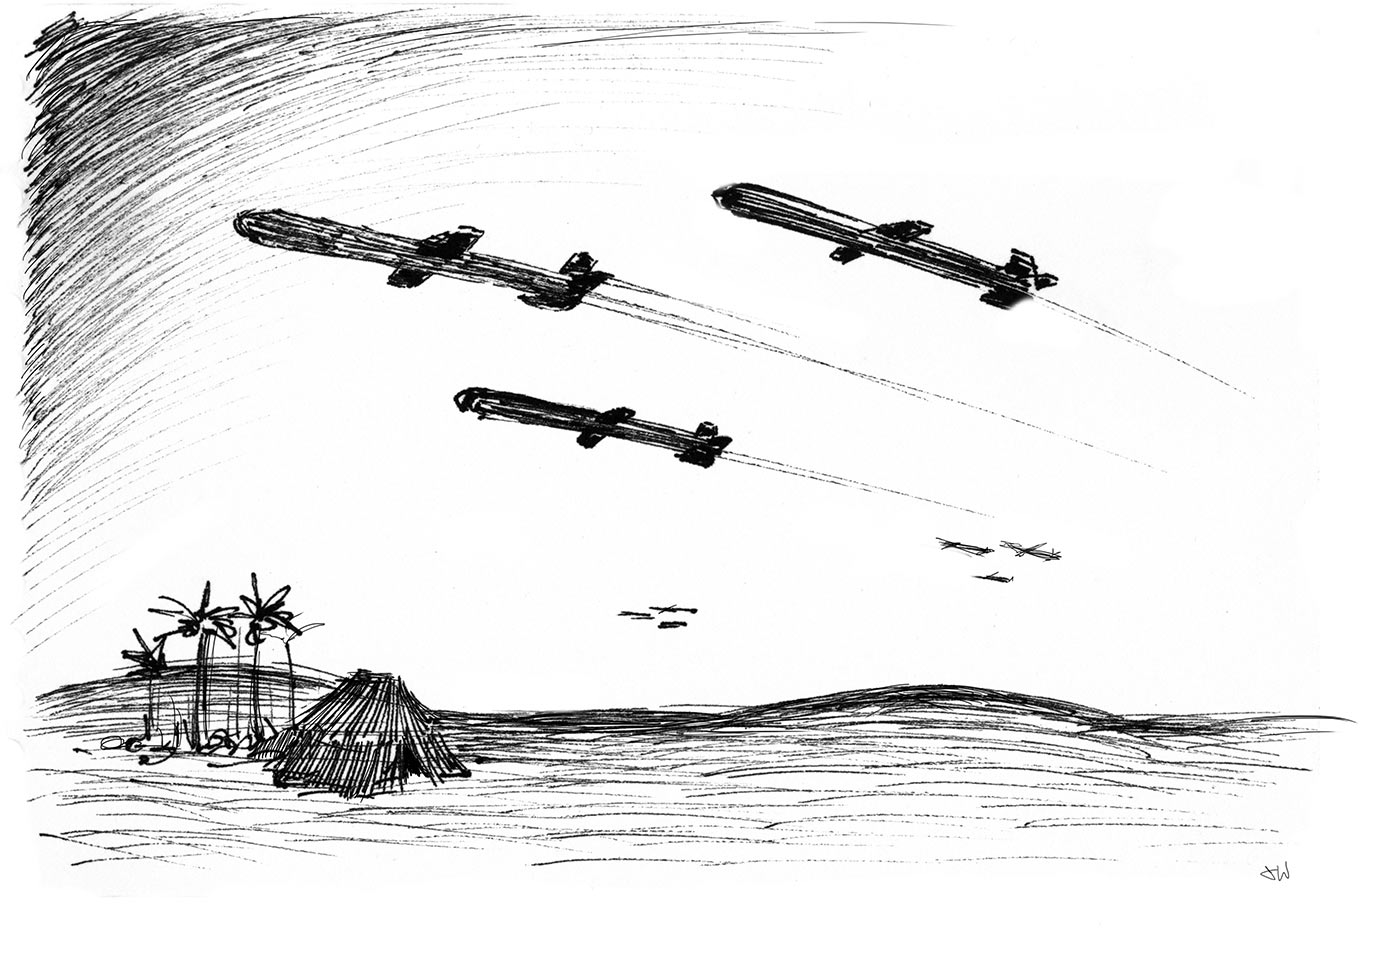 Cruide-Missiles-Desert-Night